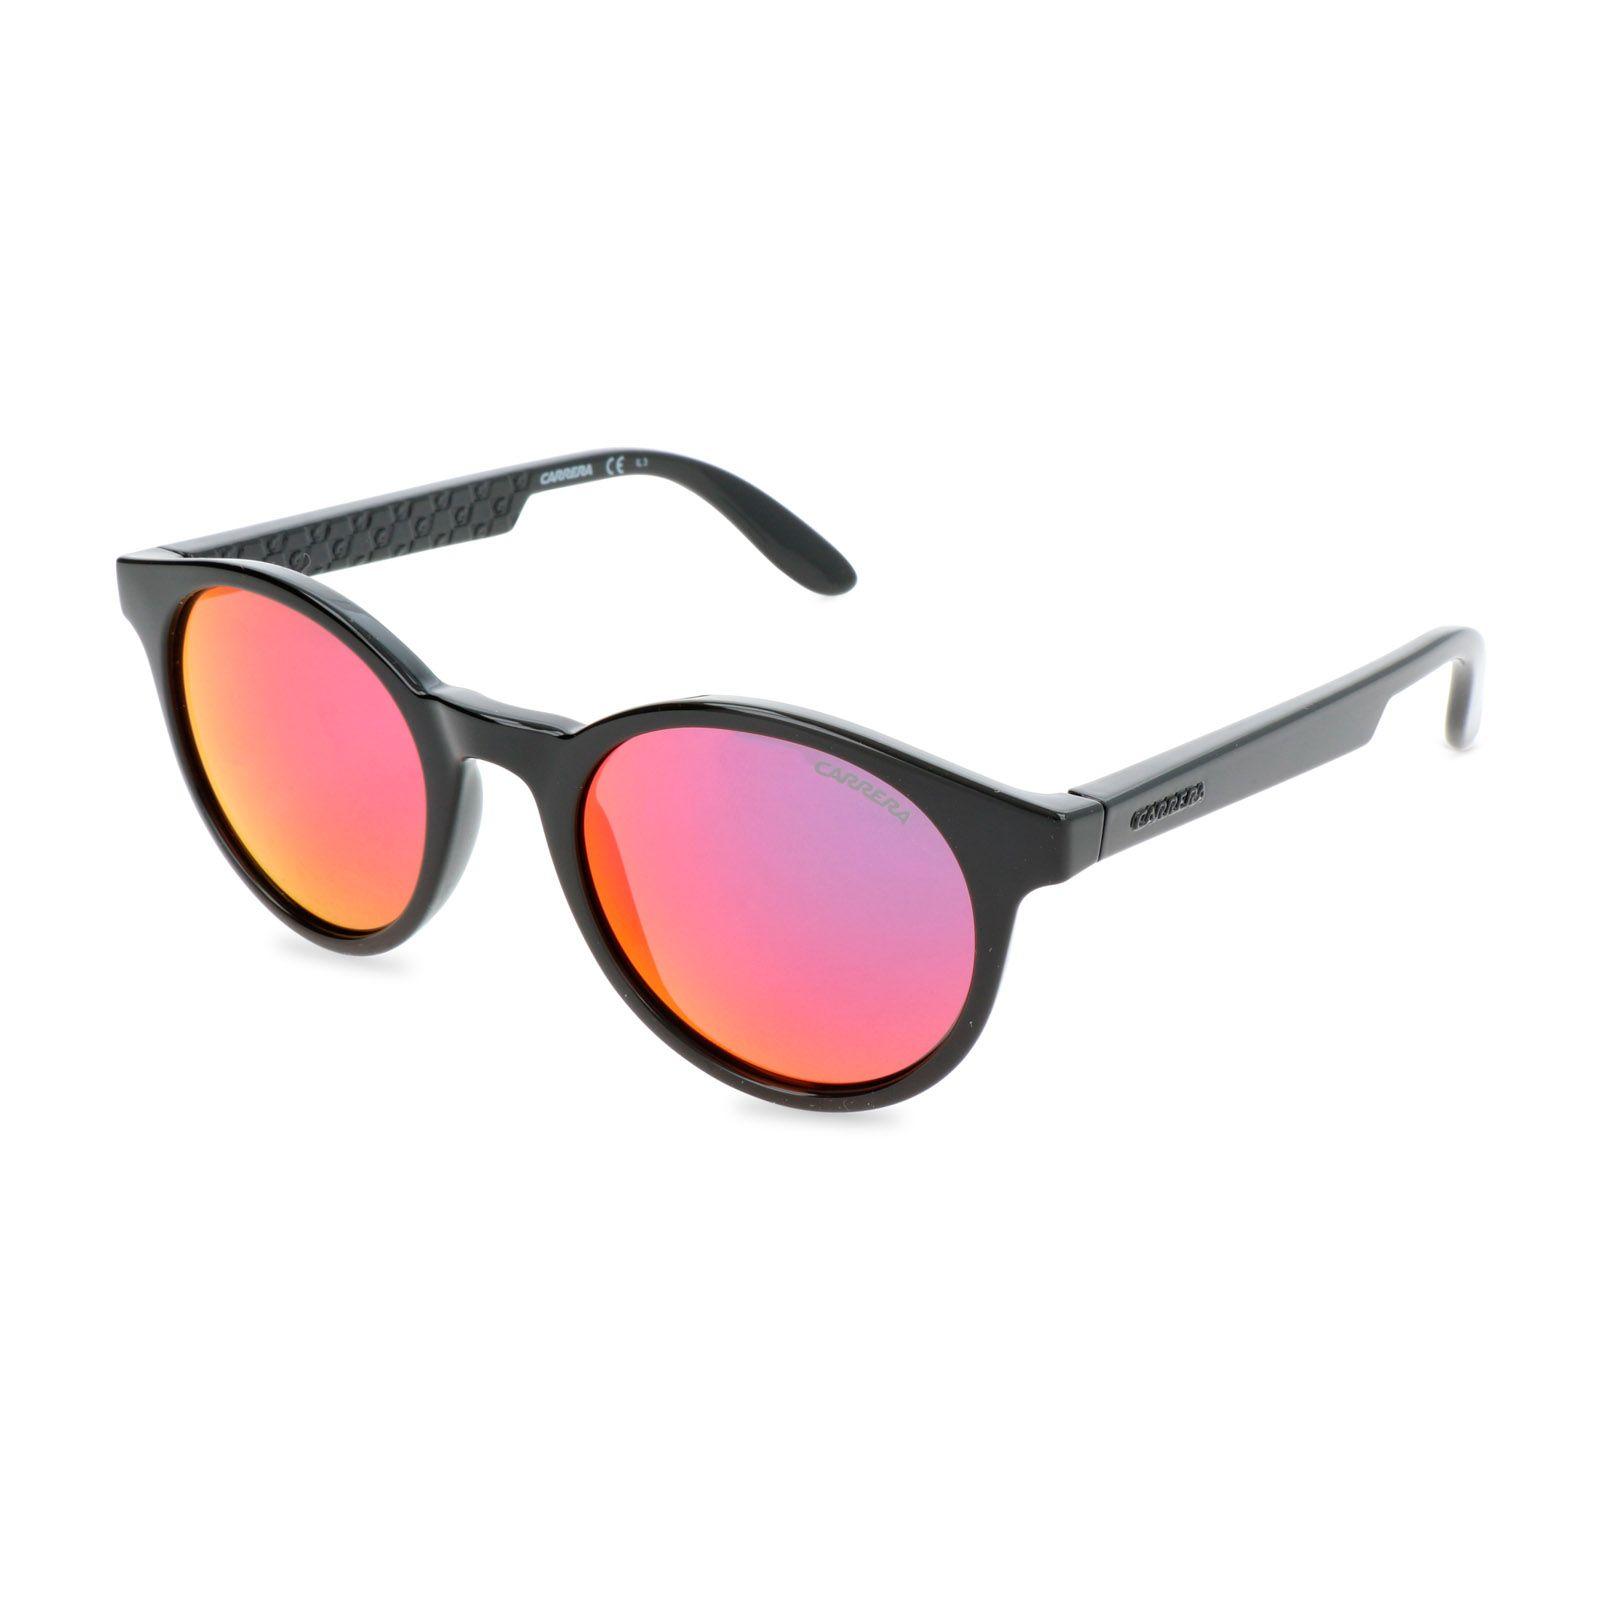 Carrera Mens Sunglasses